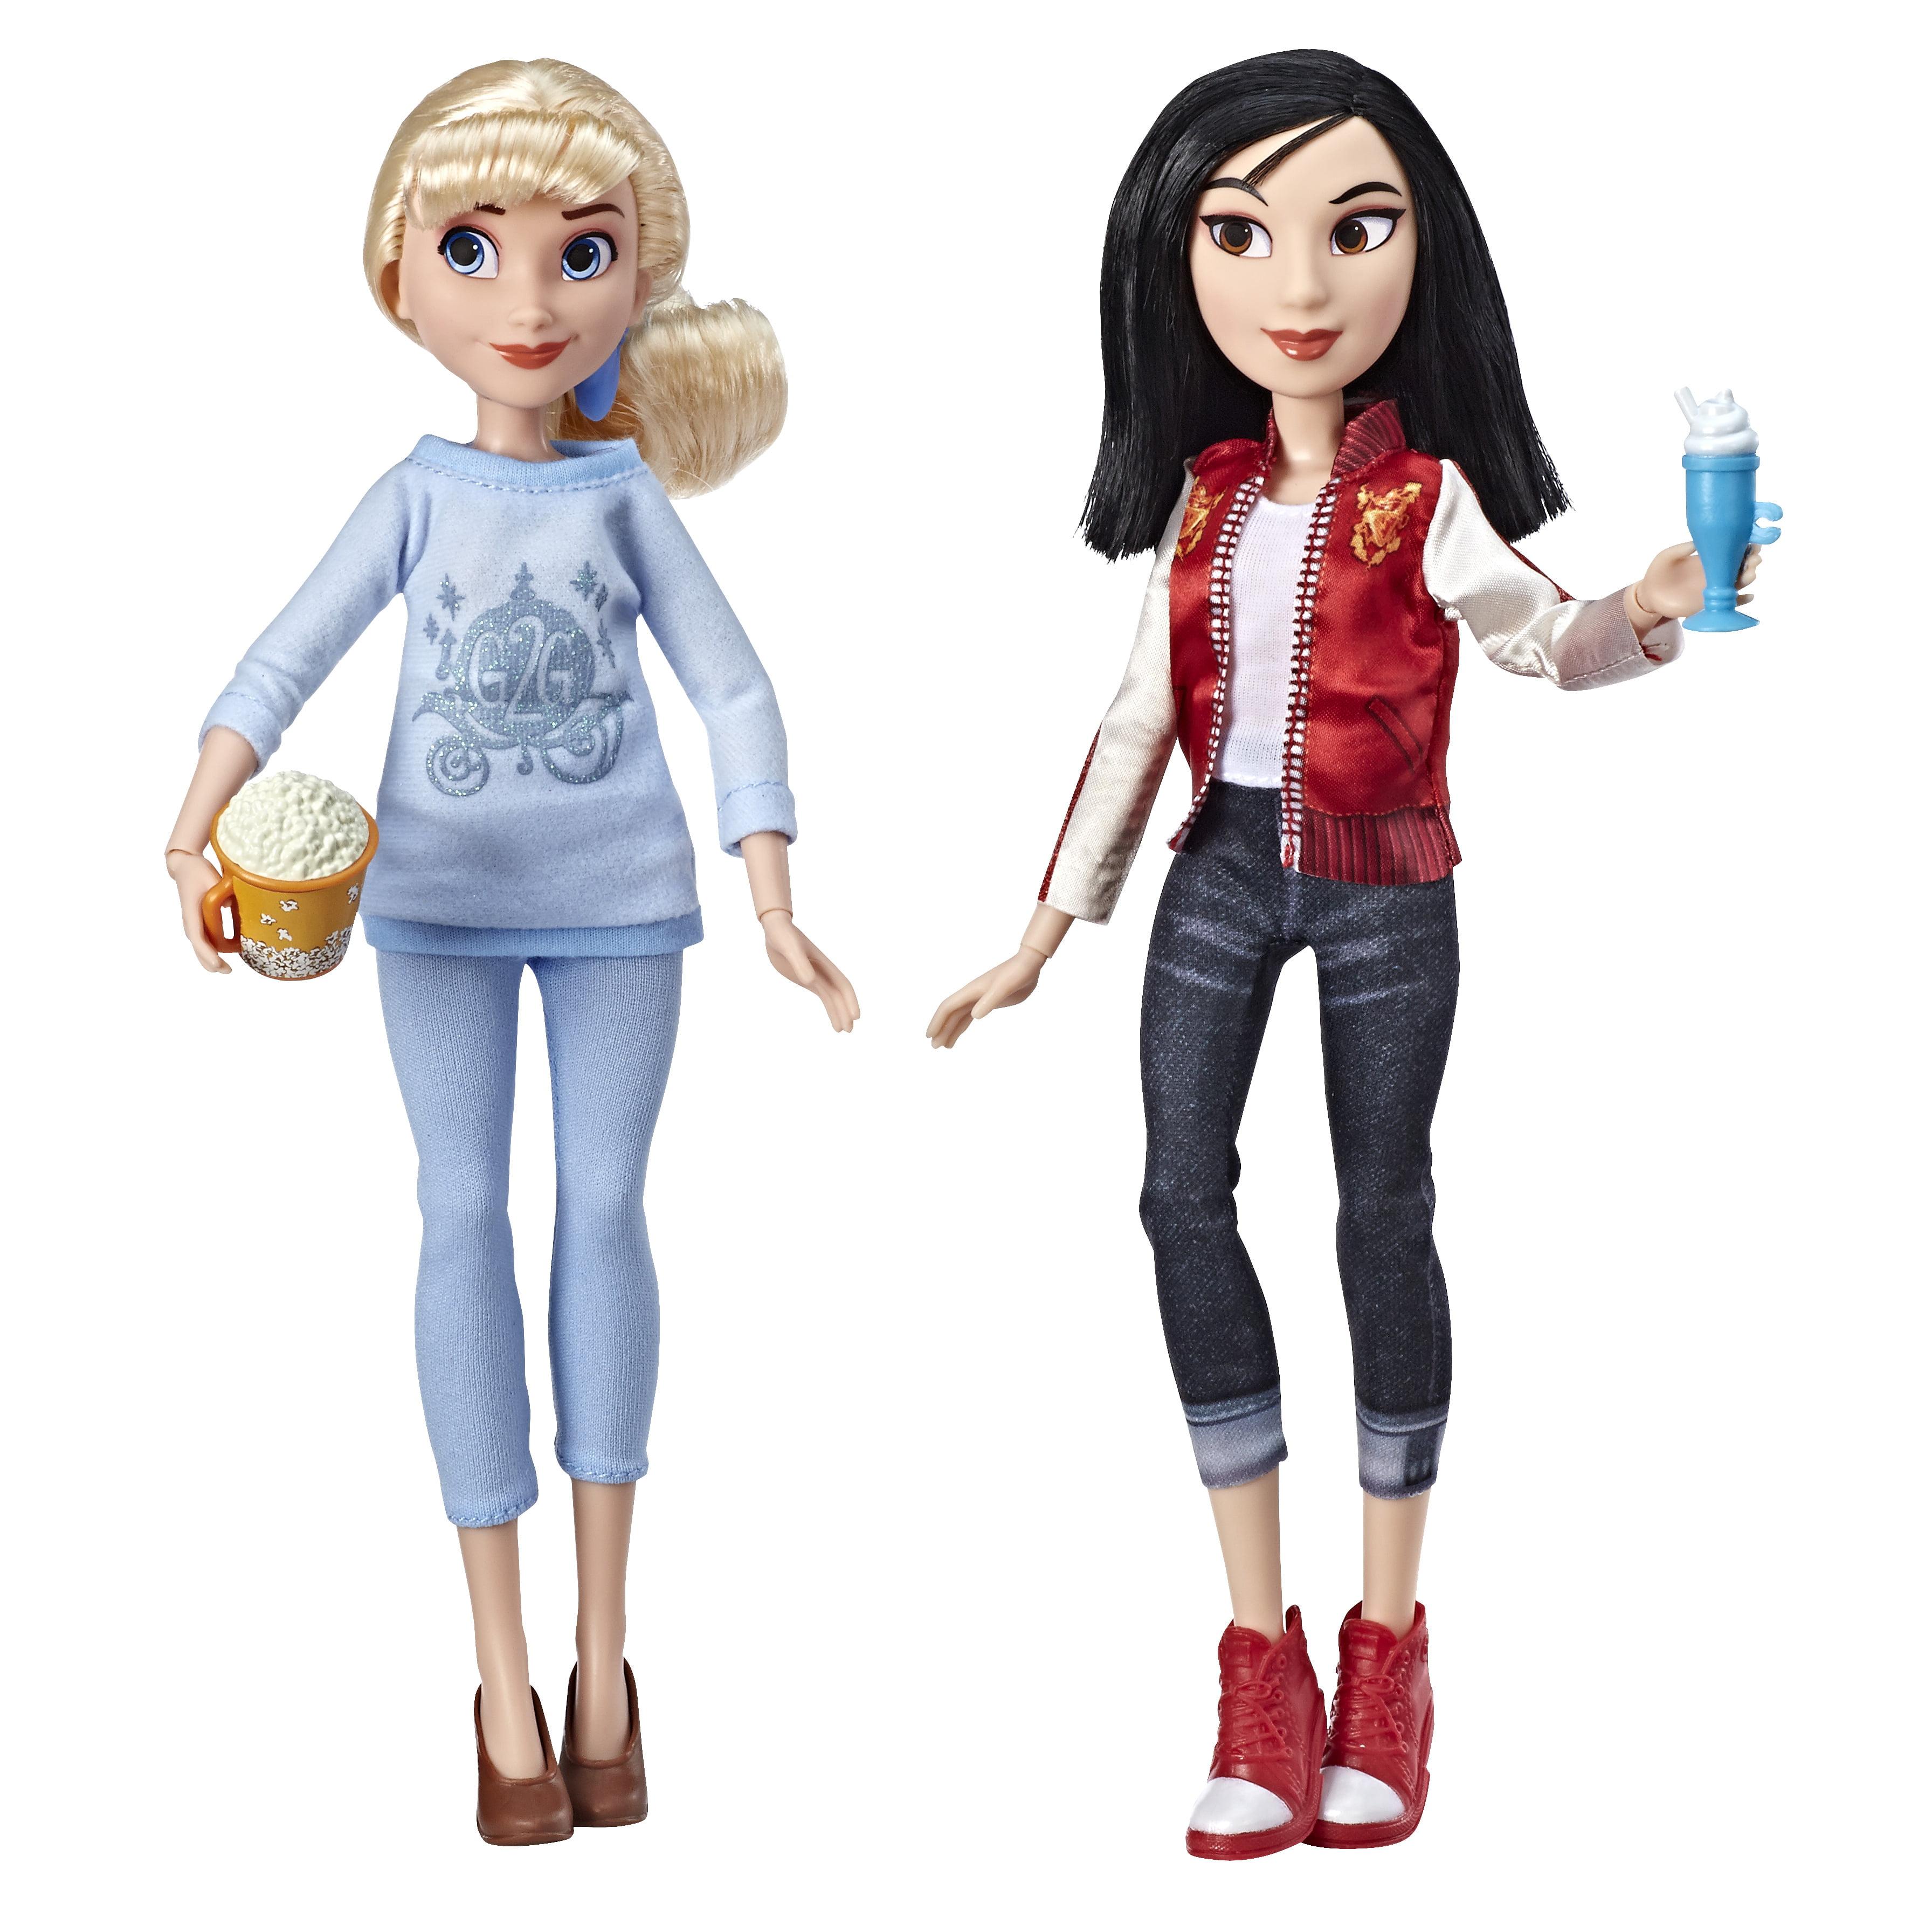 Disney Princess Ralph Breaks The Internet Movie Cinderella And Mulan Walmart Com Walmart Com